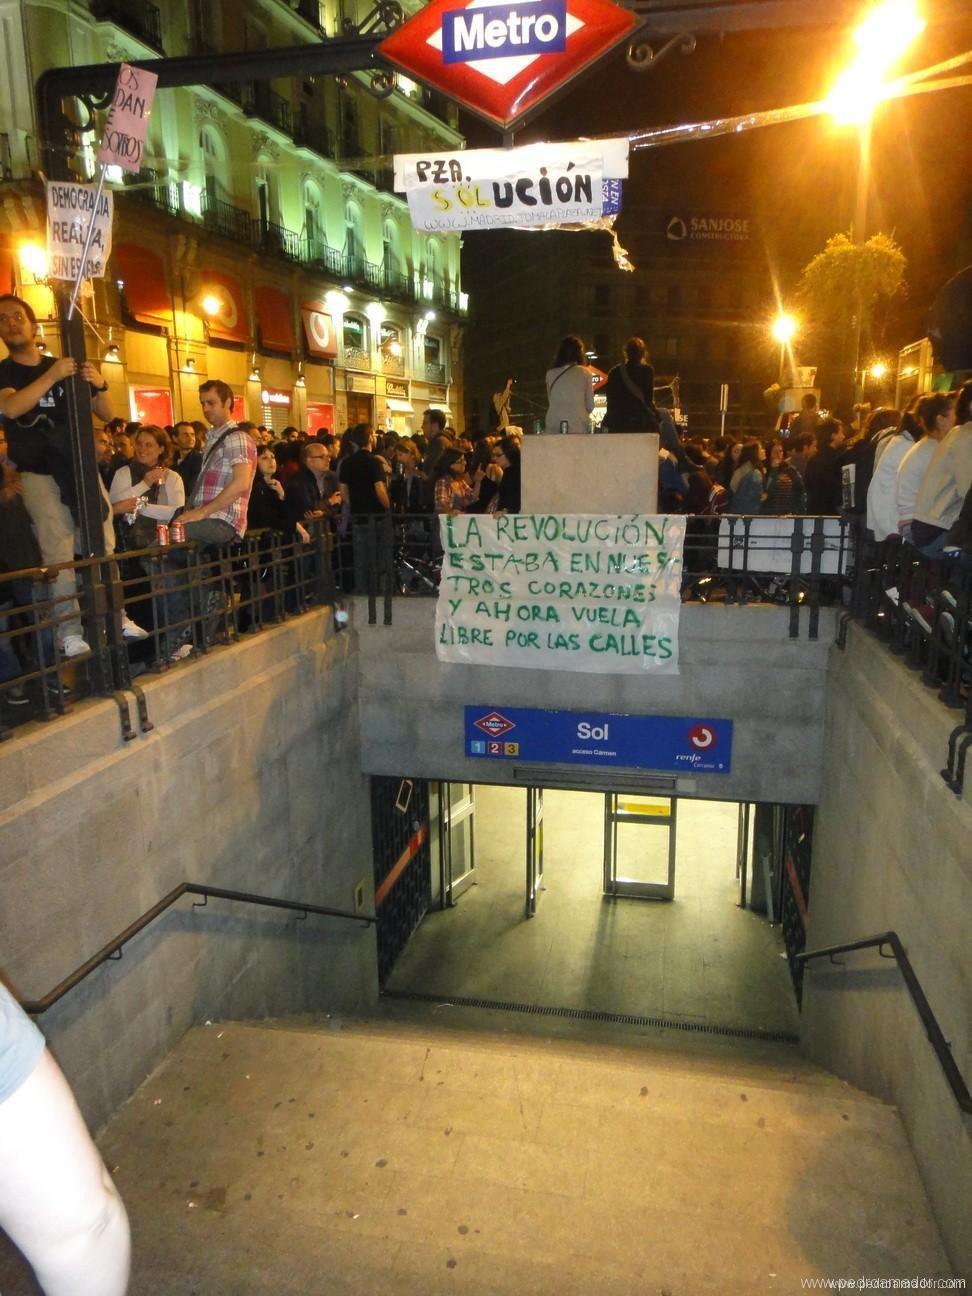 Foto de manifestacion en Madrid 15M